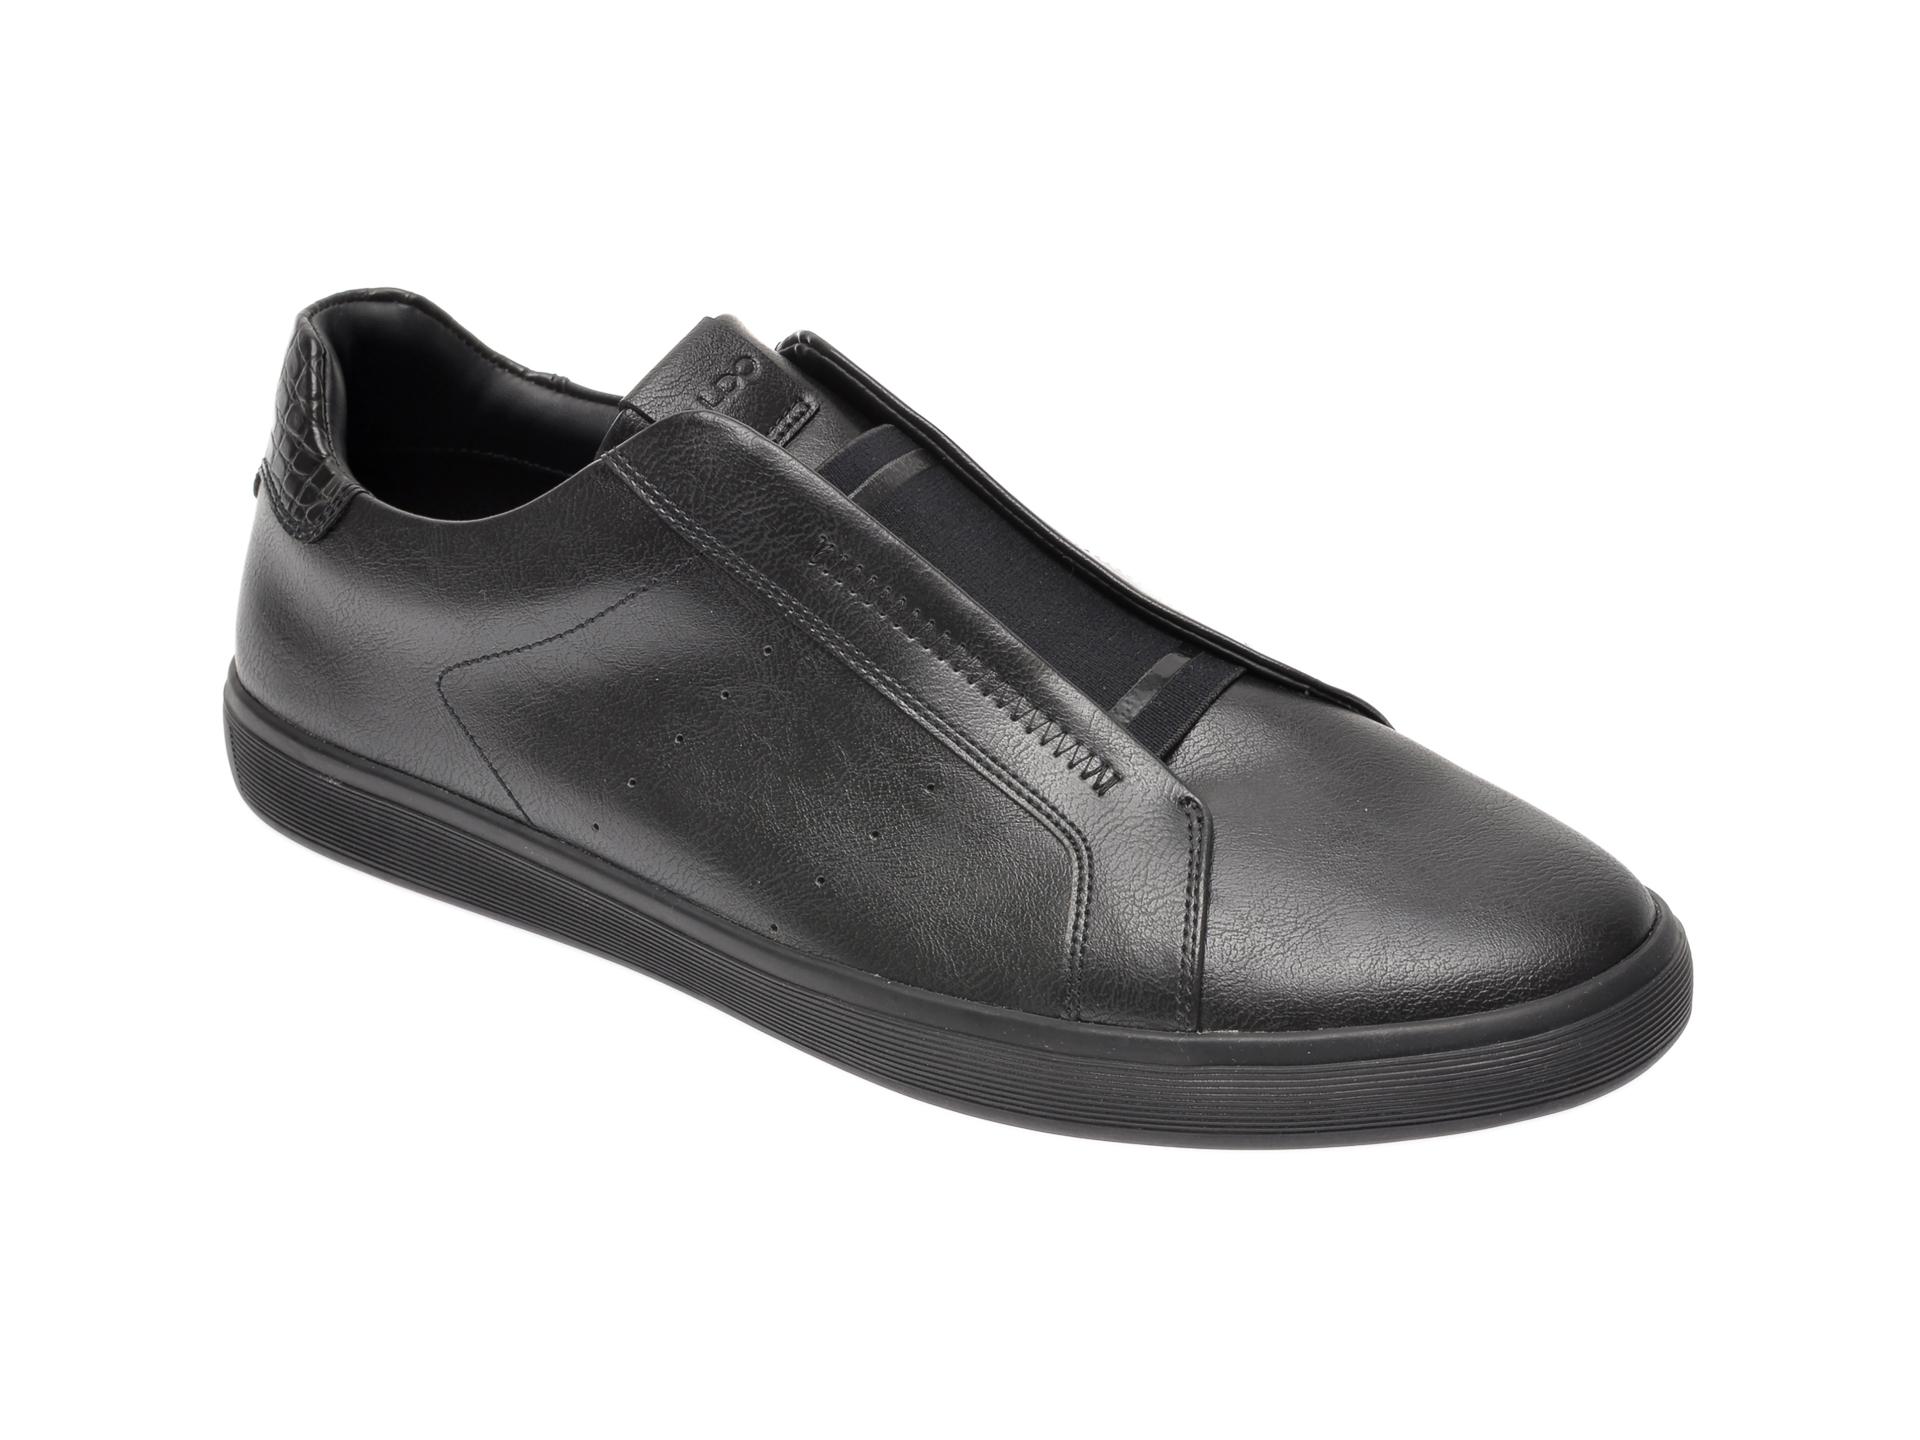 Pantofi sport ALDO negri, Boomerang001, din piele ecologica imagine otter.ro